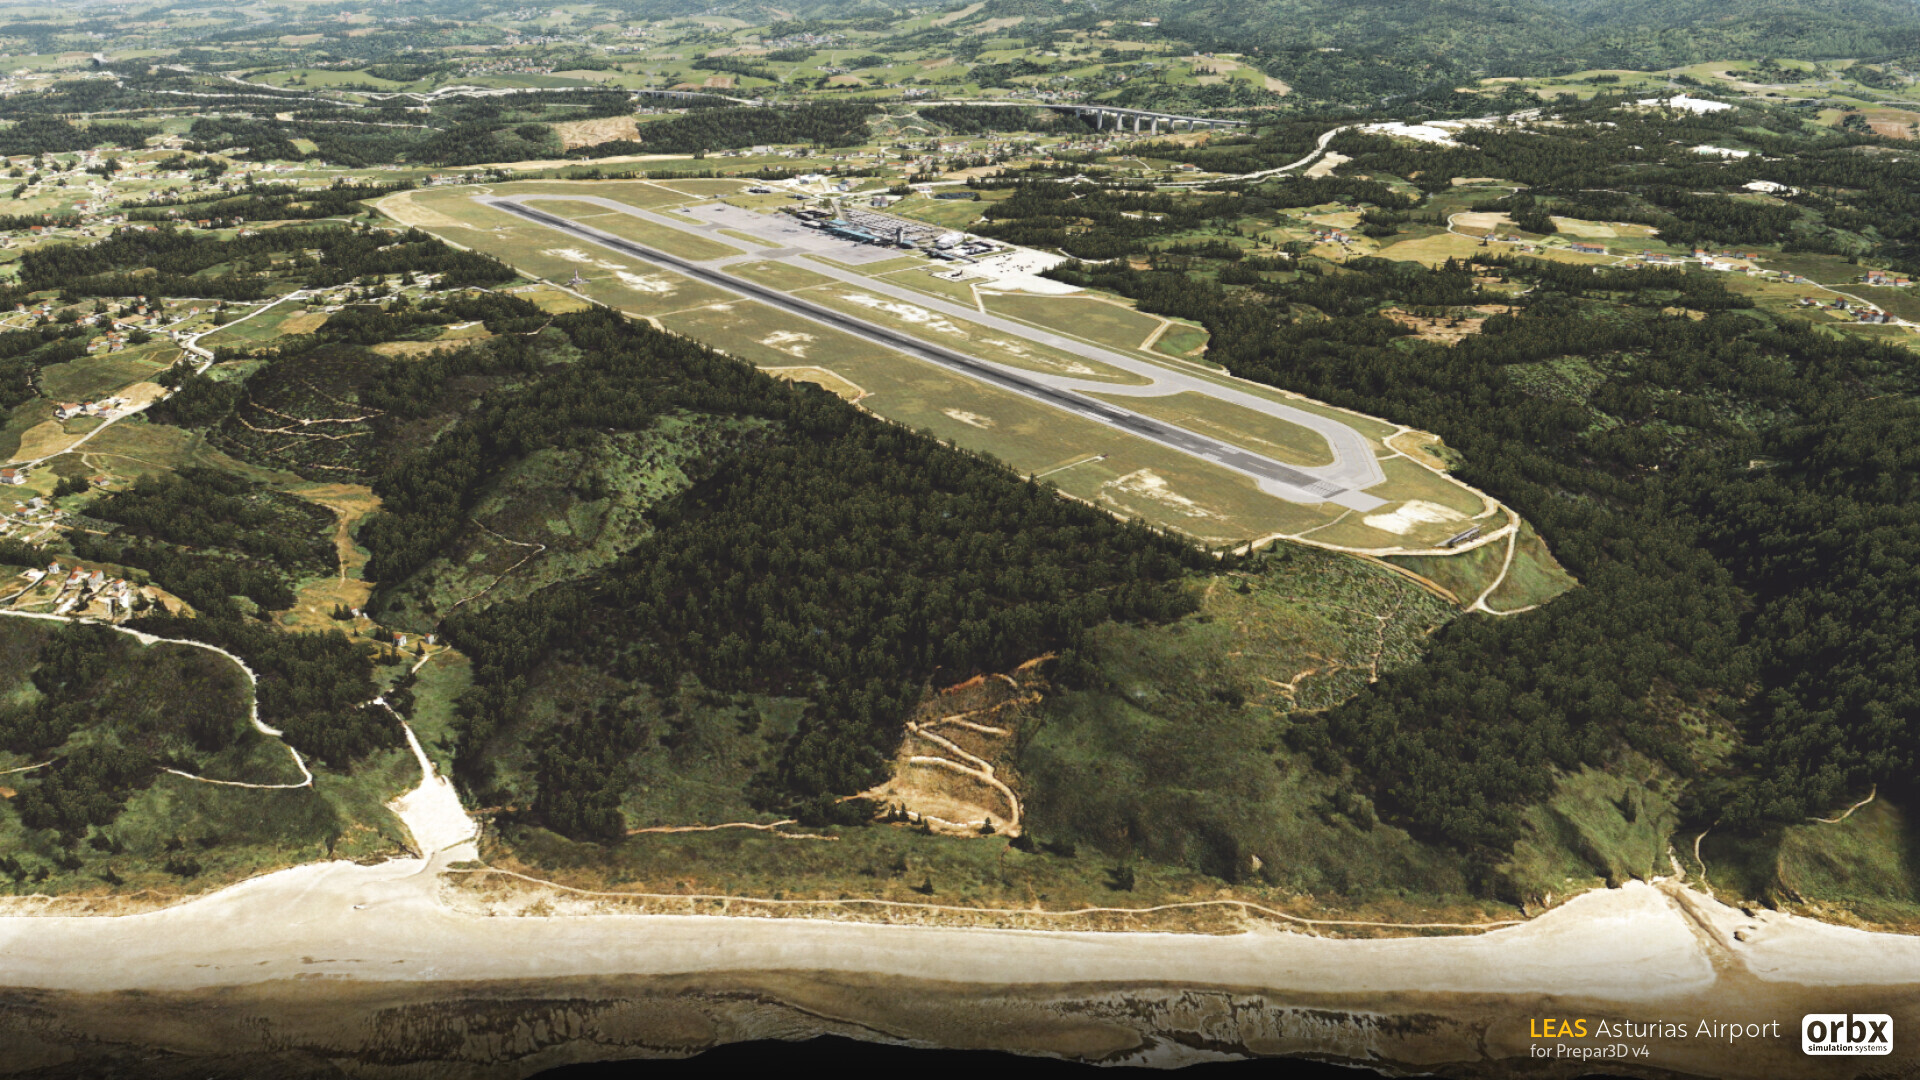 LEAS Asturias Airport - Orbx